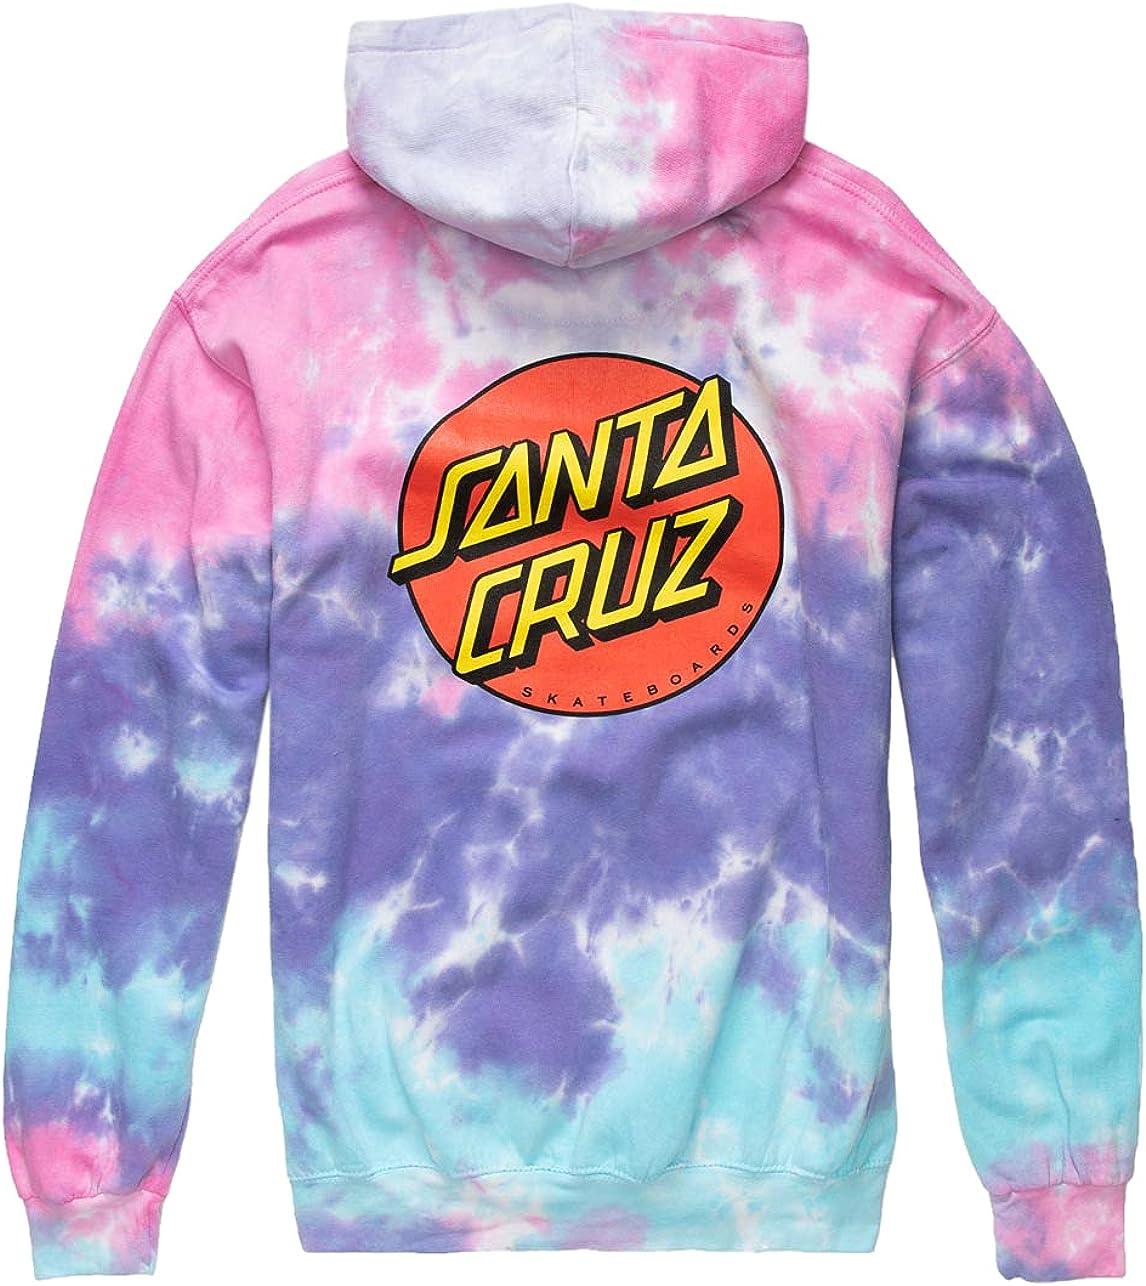 Santa Cruz Classic Dot Hoodie XXL - Candy Ranking integrated 1st Las Vegas Mall place Cotton